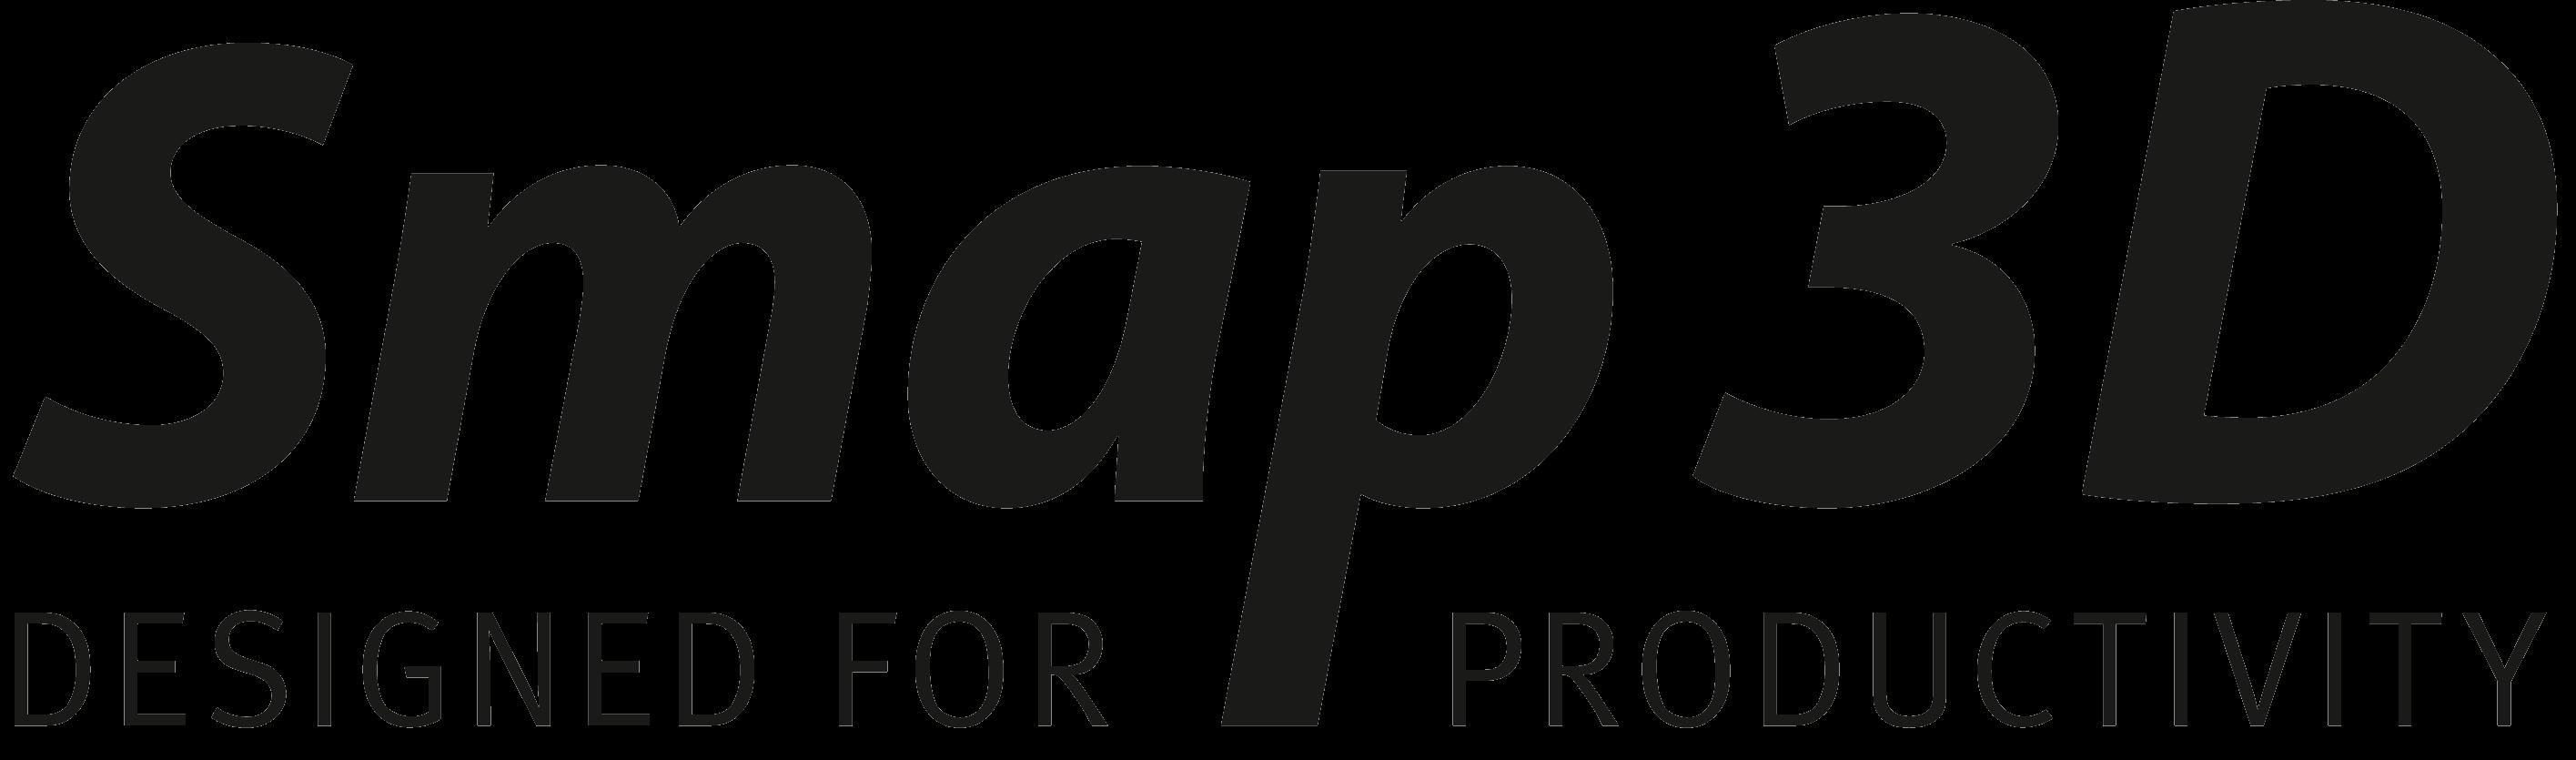 logo-smap3d-analgenbau-solidworks-coffee-gmbh